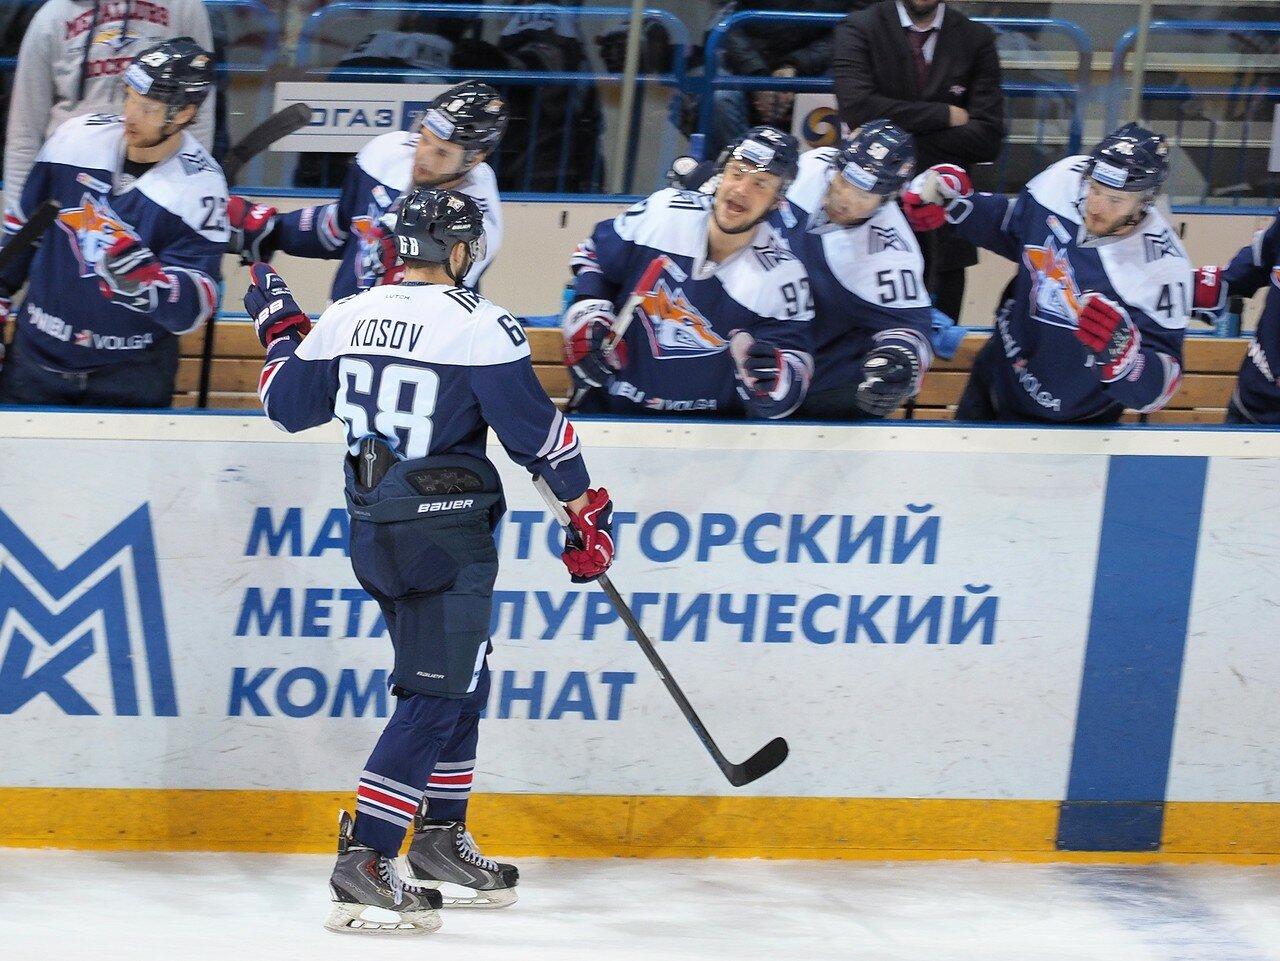 61Плей-офф 2016 Восток Финал Металлург - Салават Юлаев 25.03.2016